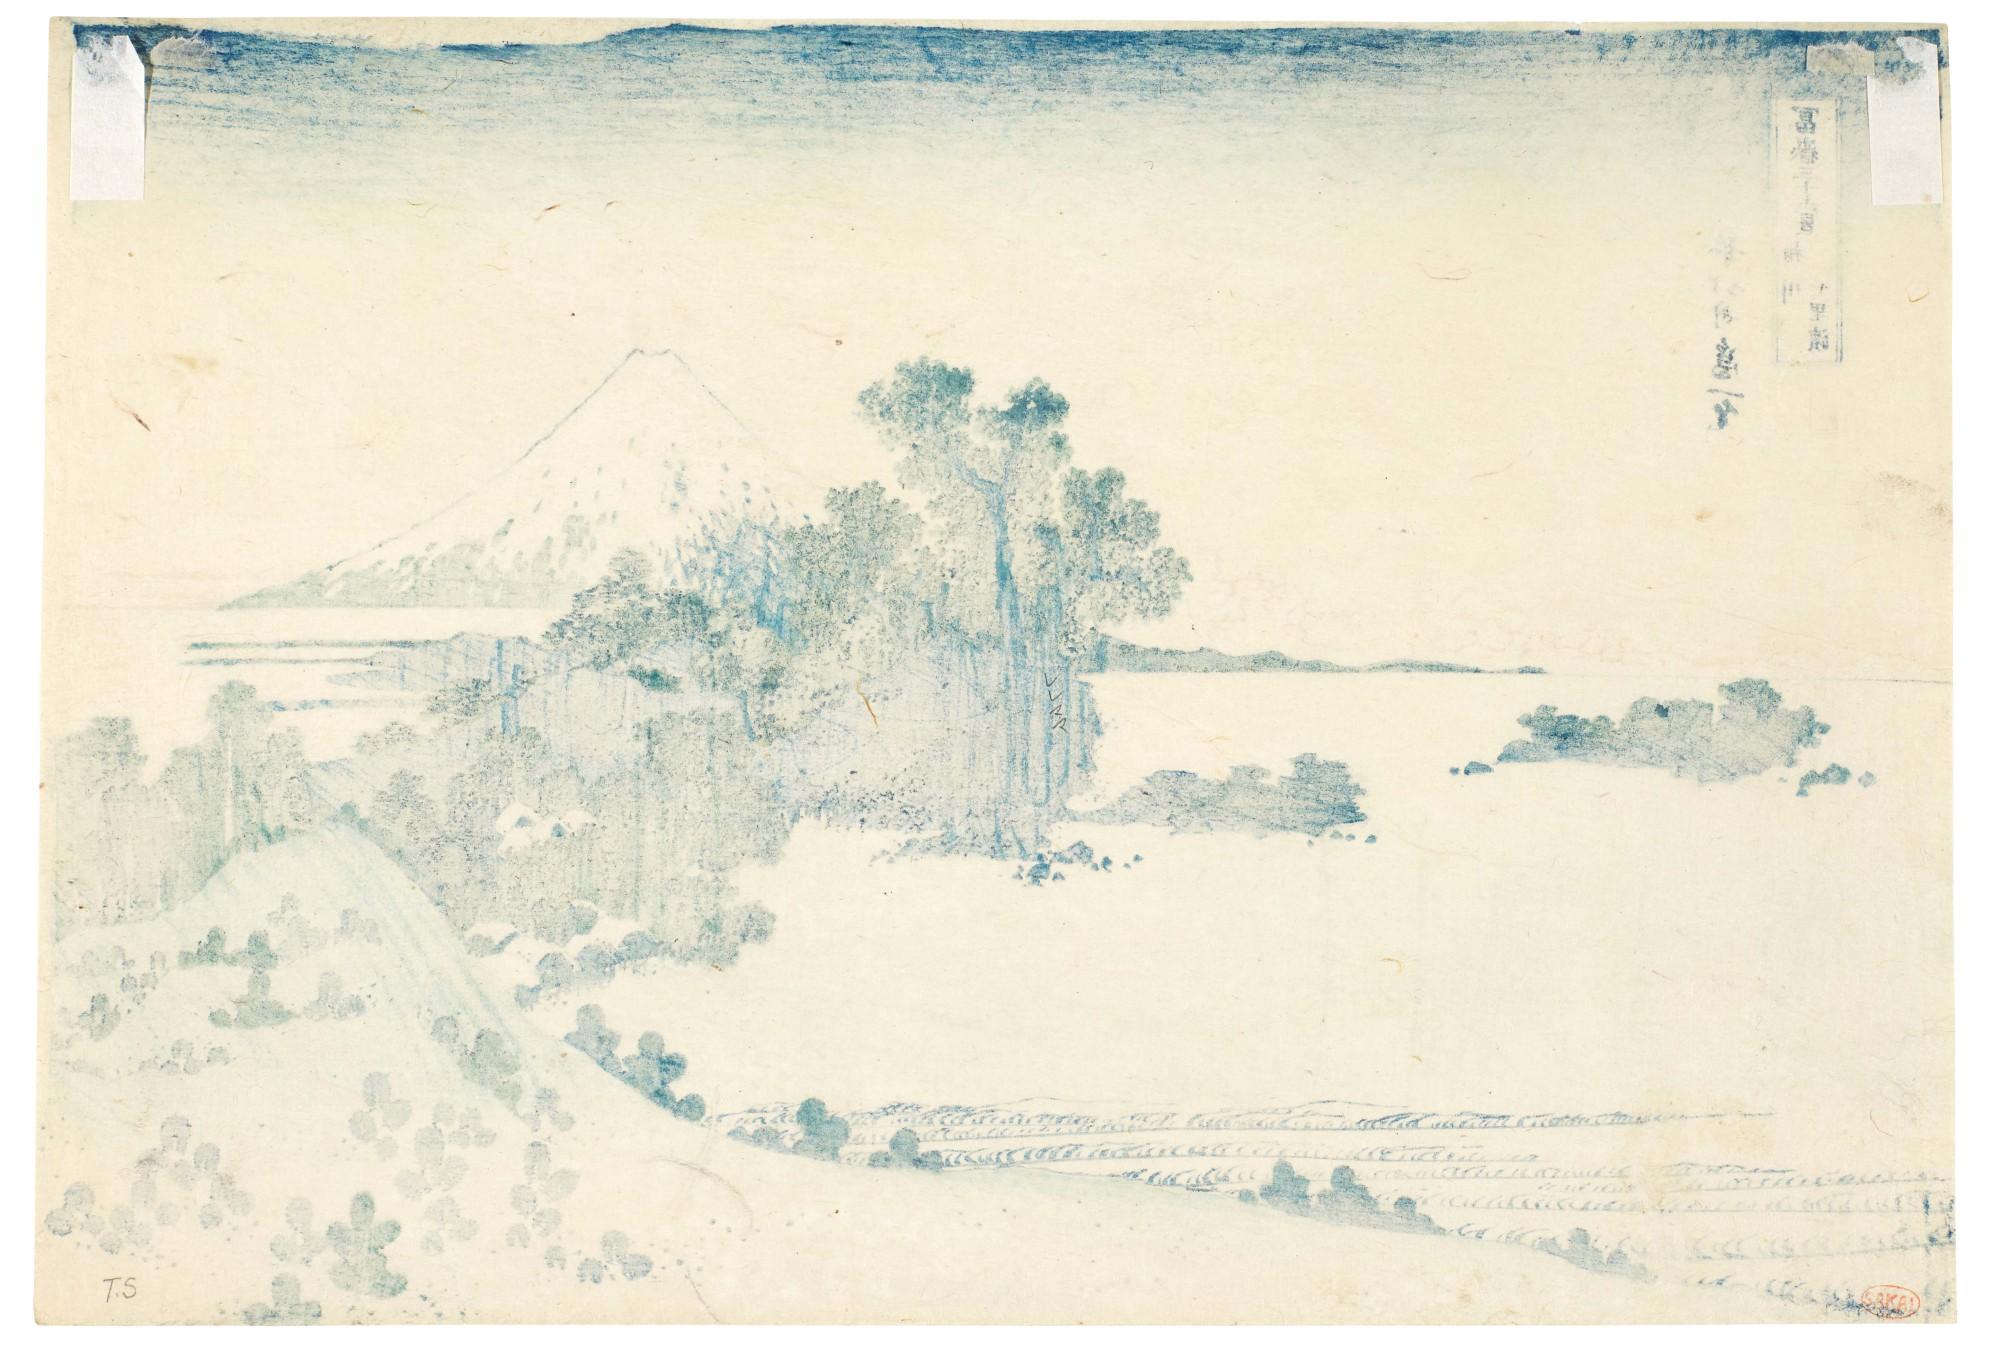 Katsushika Hokusai 1760 1849 Shichiri Beach In Sagami Province Soshu Shichiri Ga Hama Edo Period 19th Century Private Collection Of Fine Japanese Prints Japanese Sotheby S